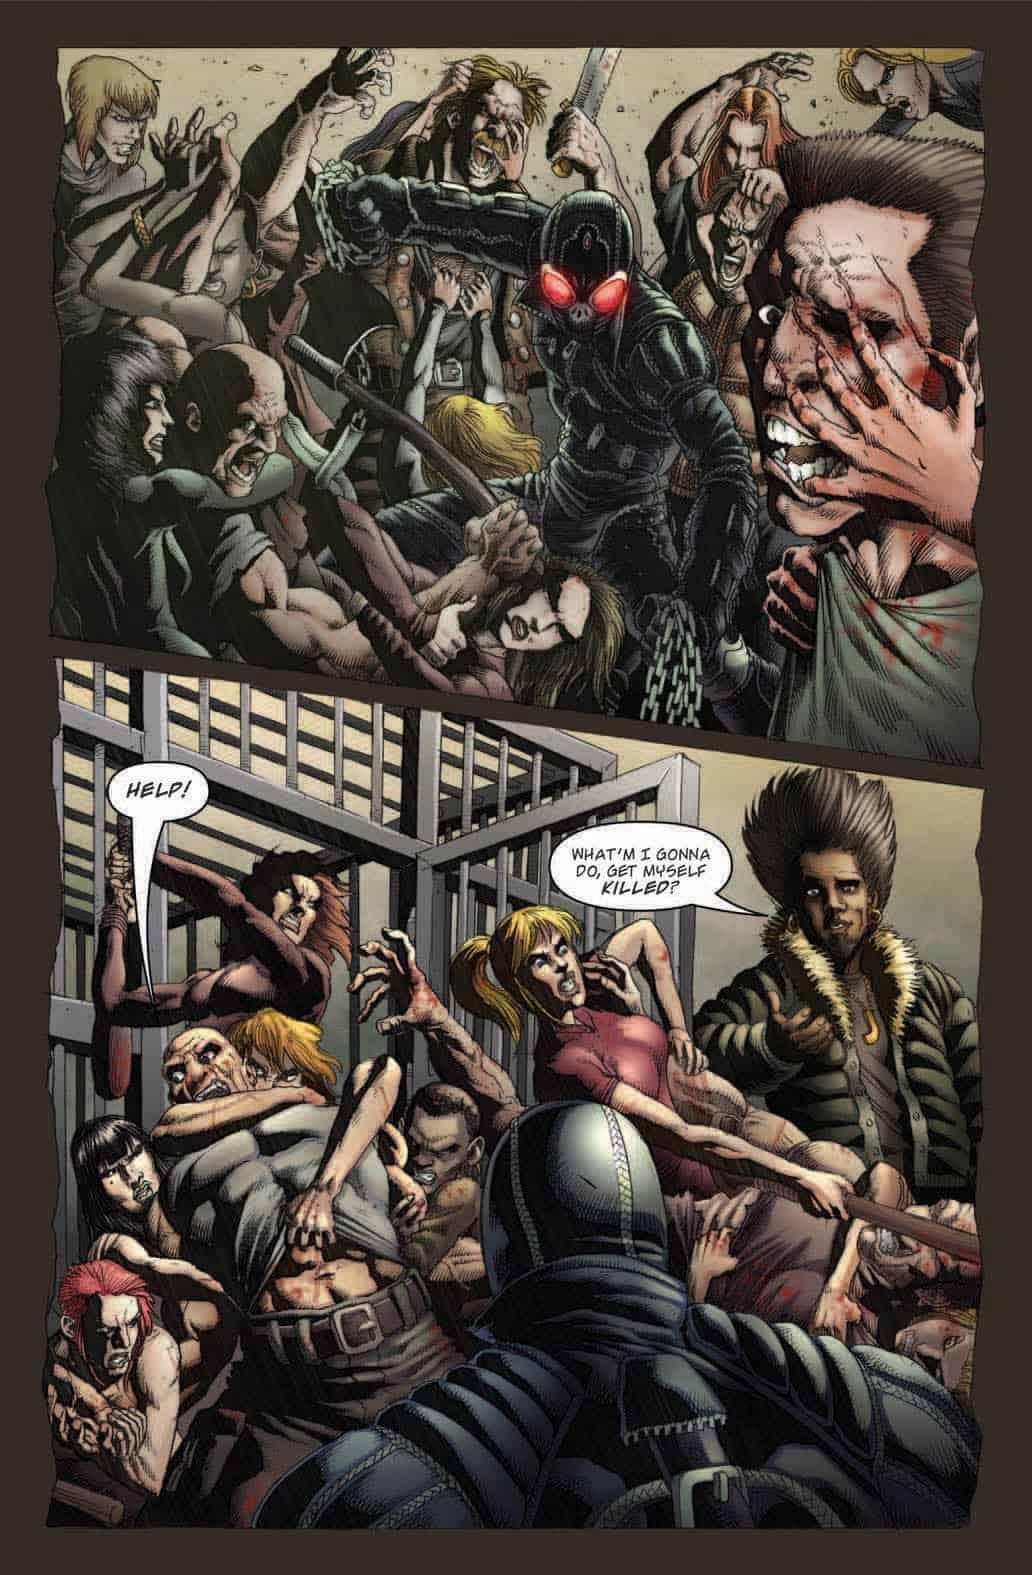 Simmons-Comics-Anthology-Vol-2-image-02